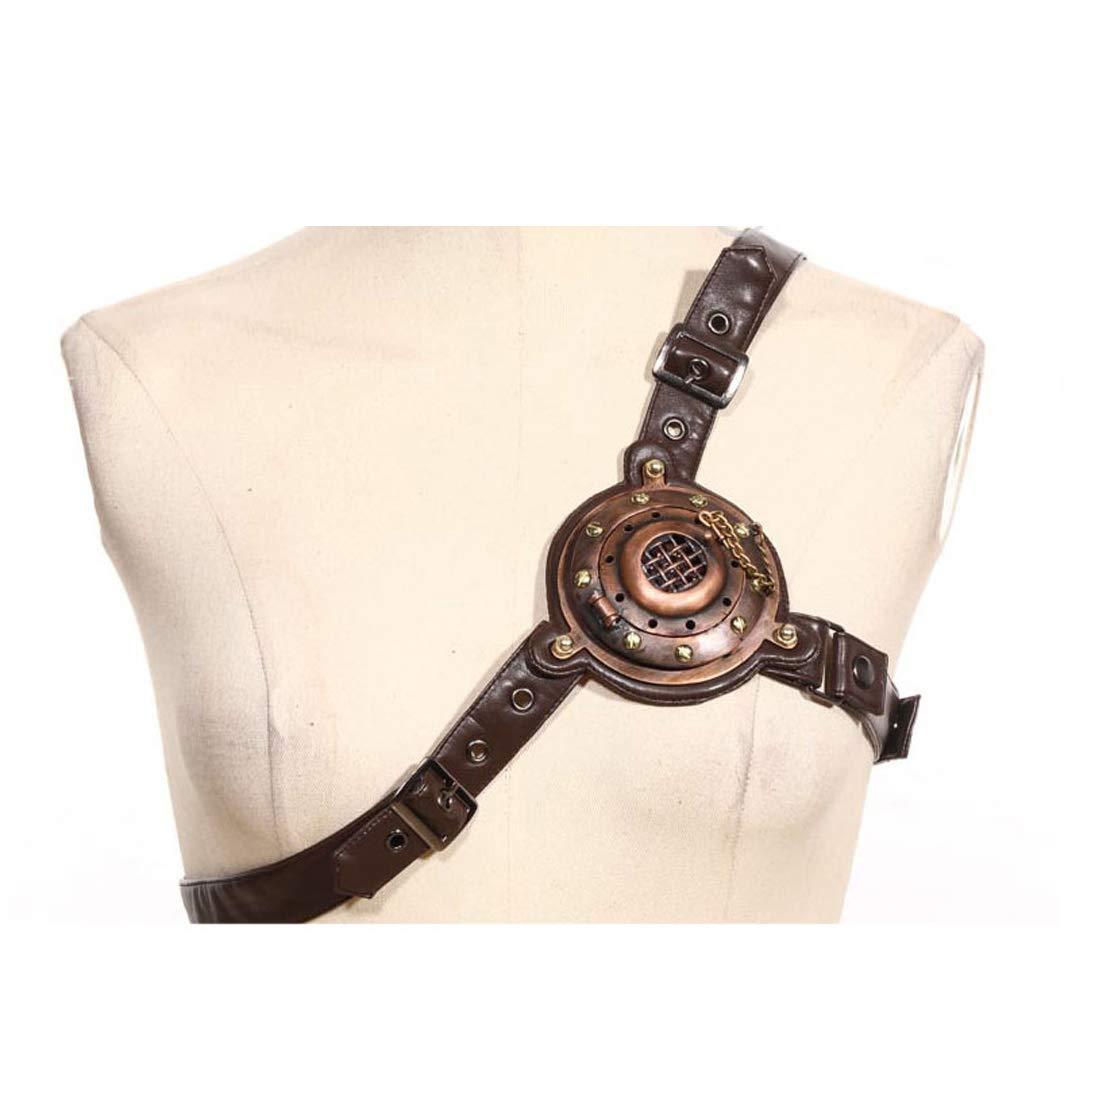 Fengxinwuzi unisex Steampunk vittoriano imbracatura cinghie cintura accessorio con luce LED Adventurer costume Marroneee, Marronee, large